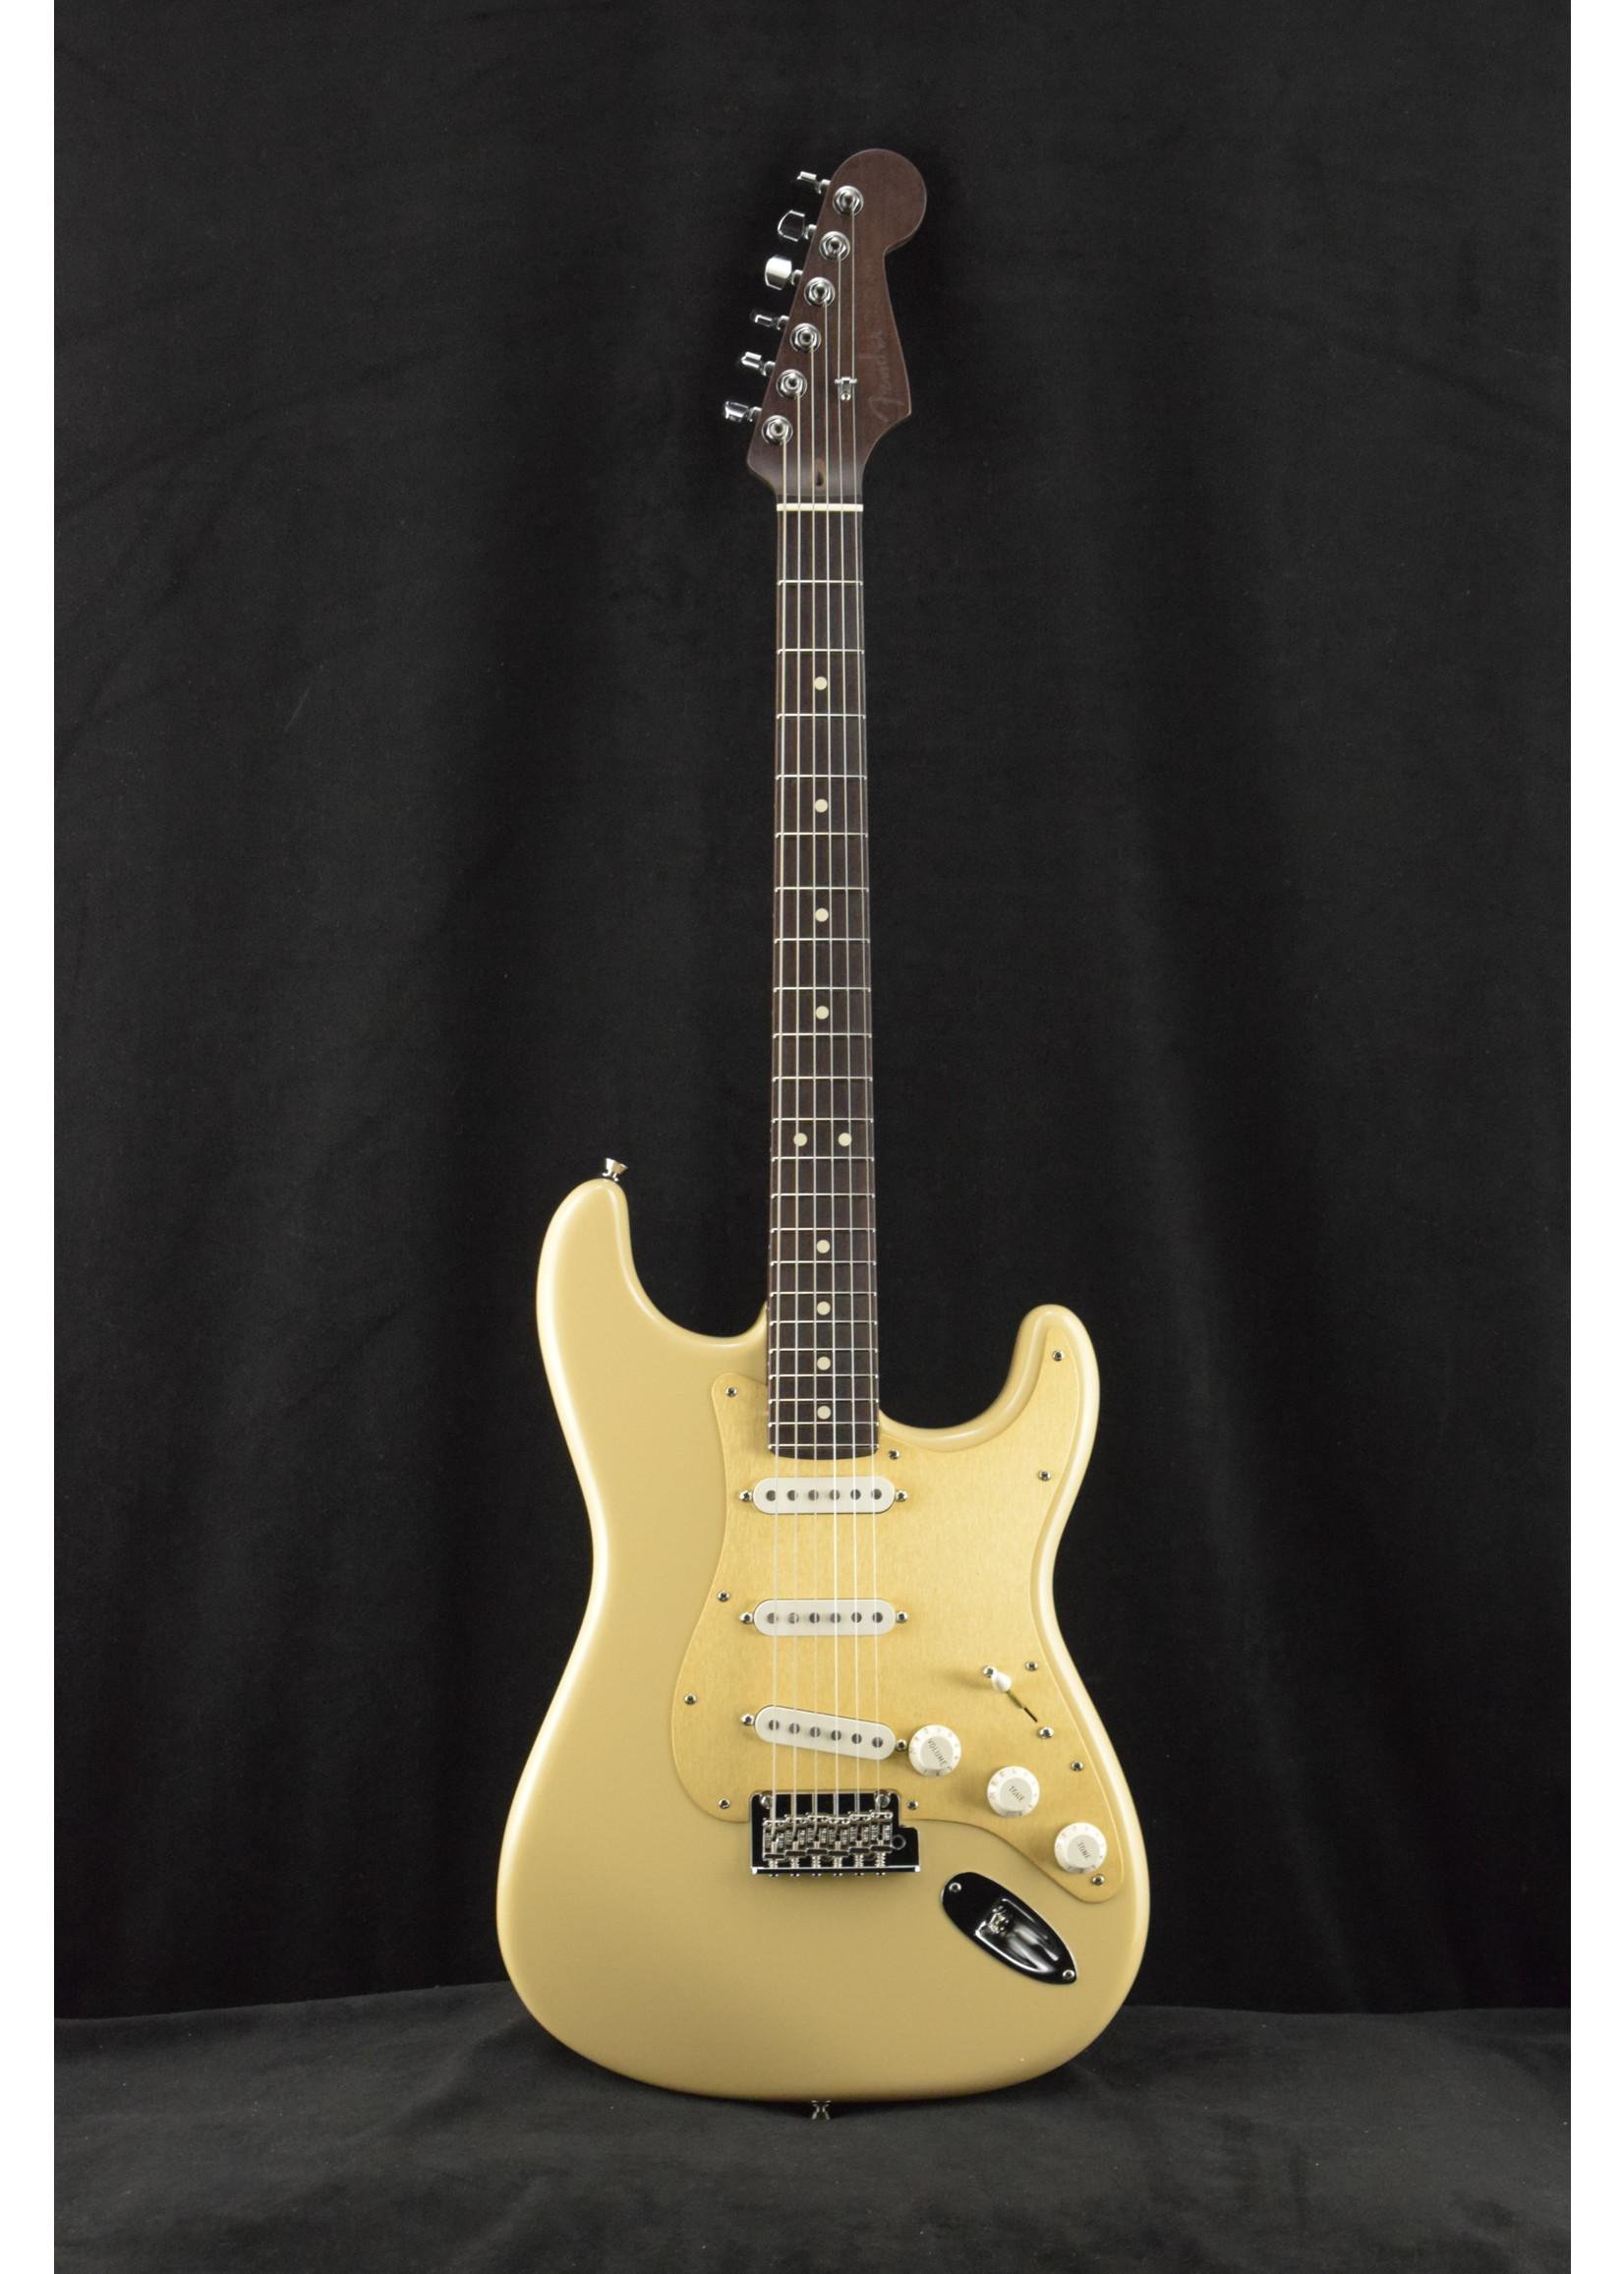 Fender Fender LTD American Professional Stratocaster Solid Rosewood Neck Desert Sand